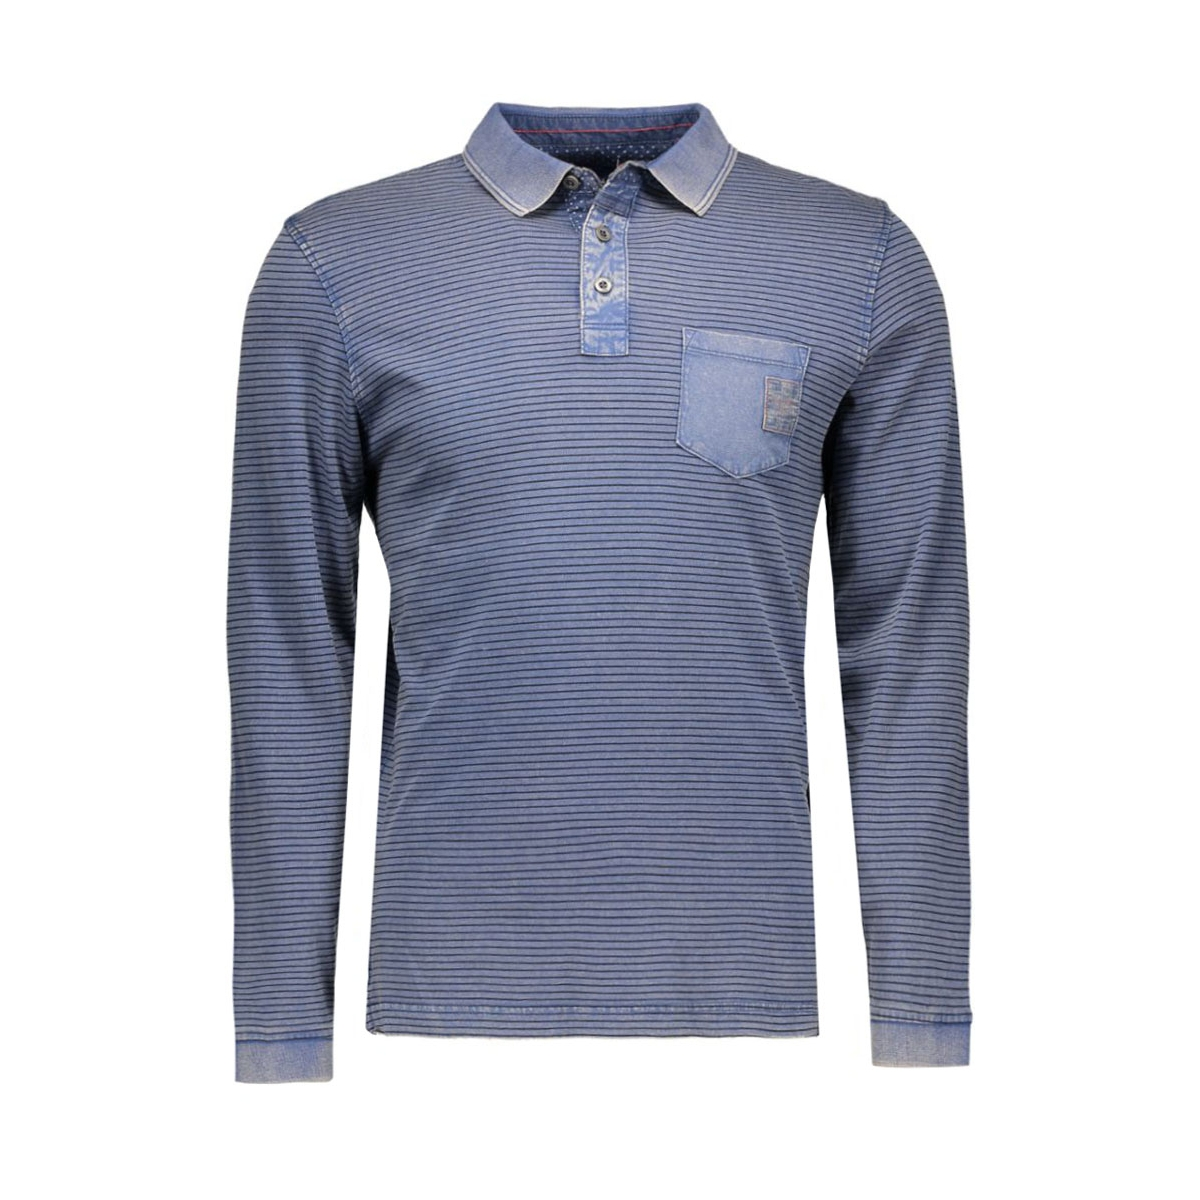 1530951.00.10 tom tailor overhemd 6758